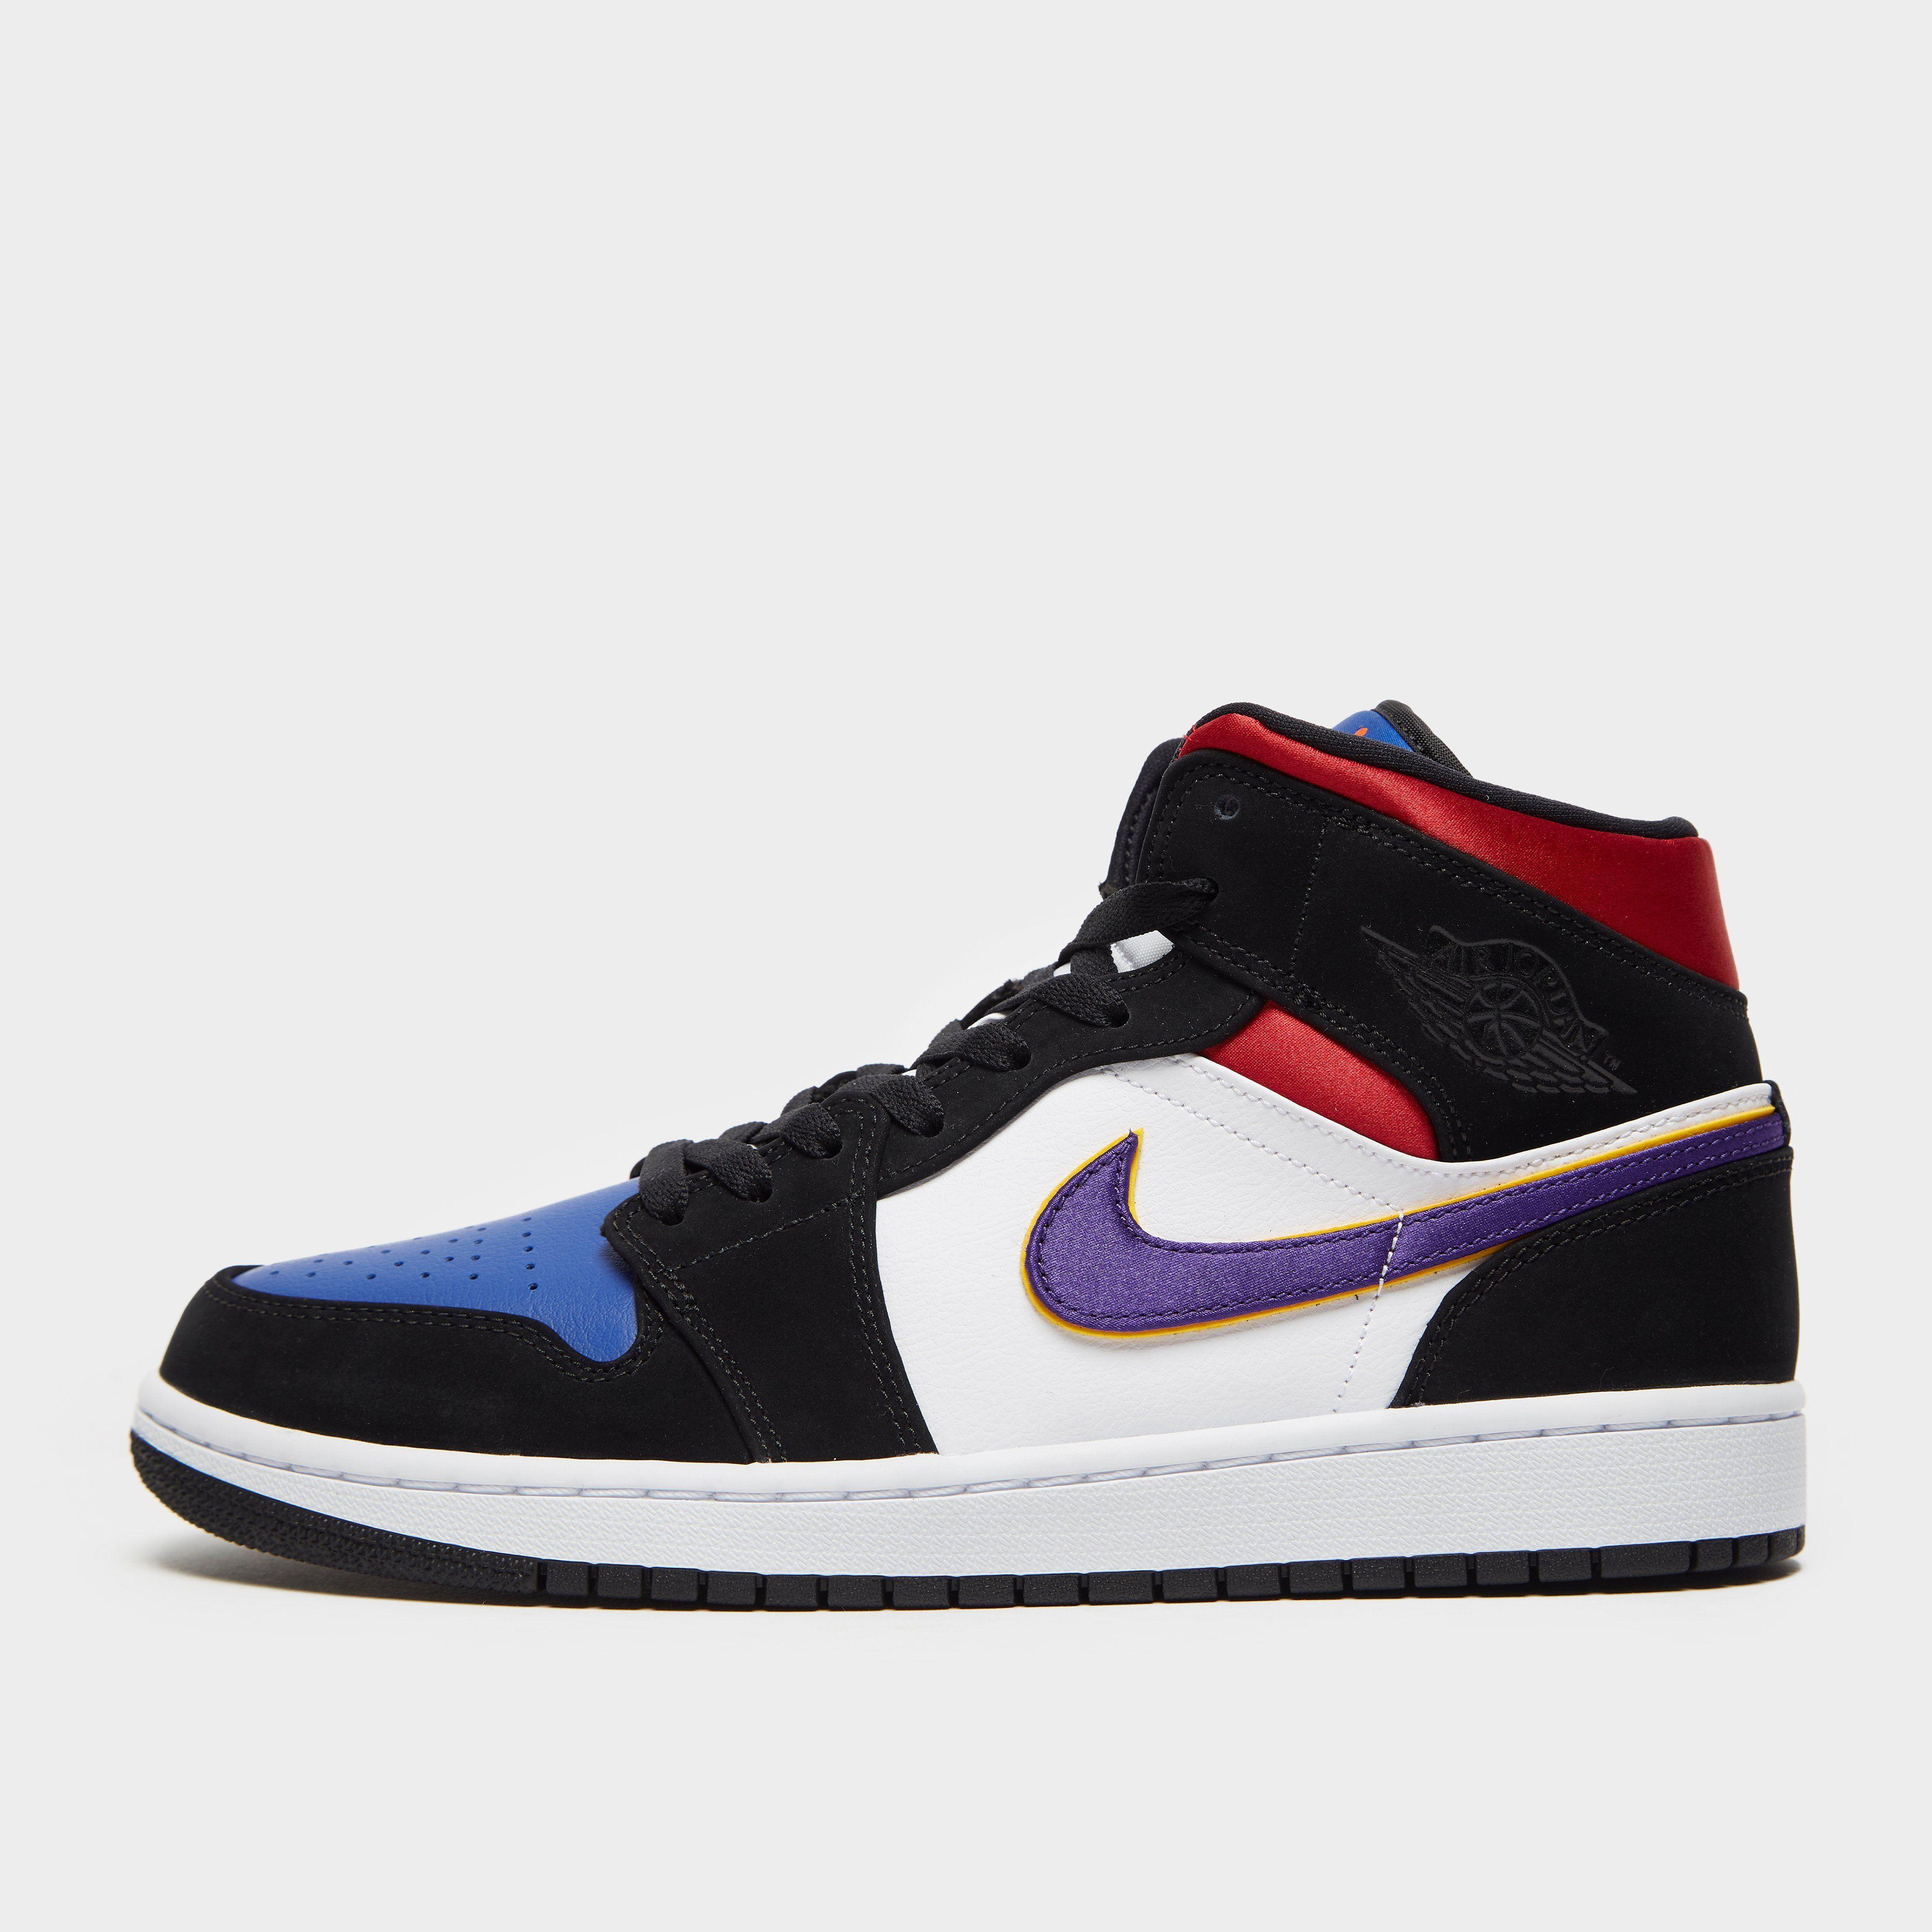 Nike Air 1 Chaussures Mid Fitn De Jordan gfIY76vby